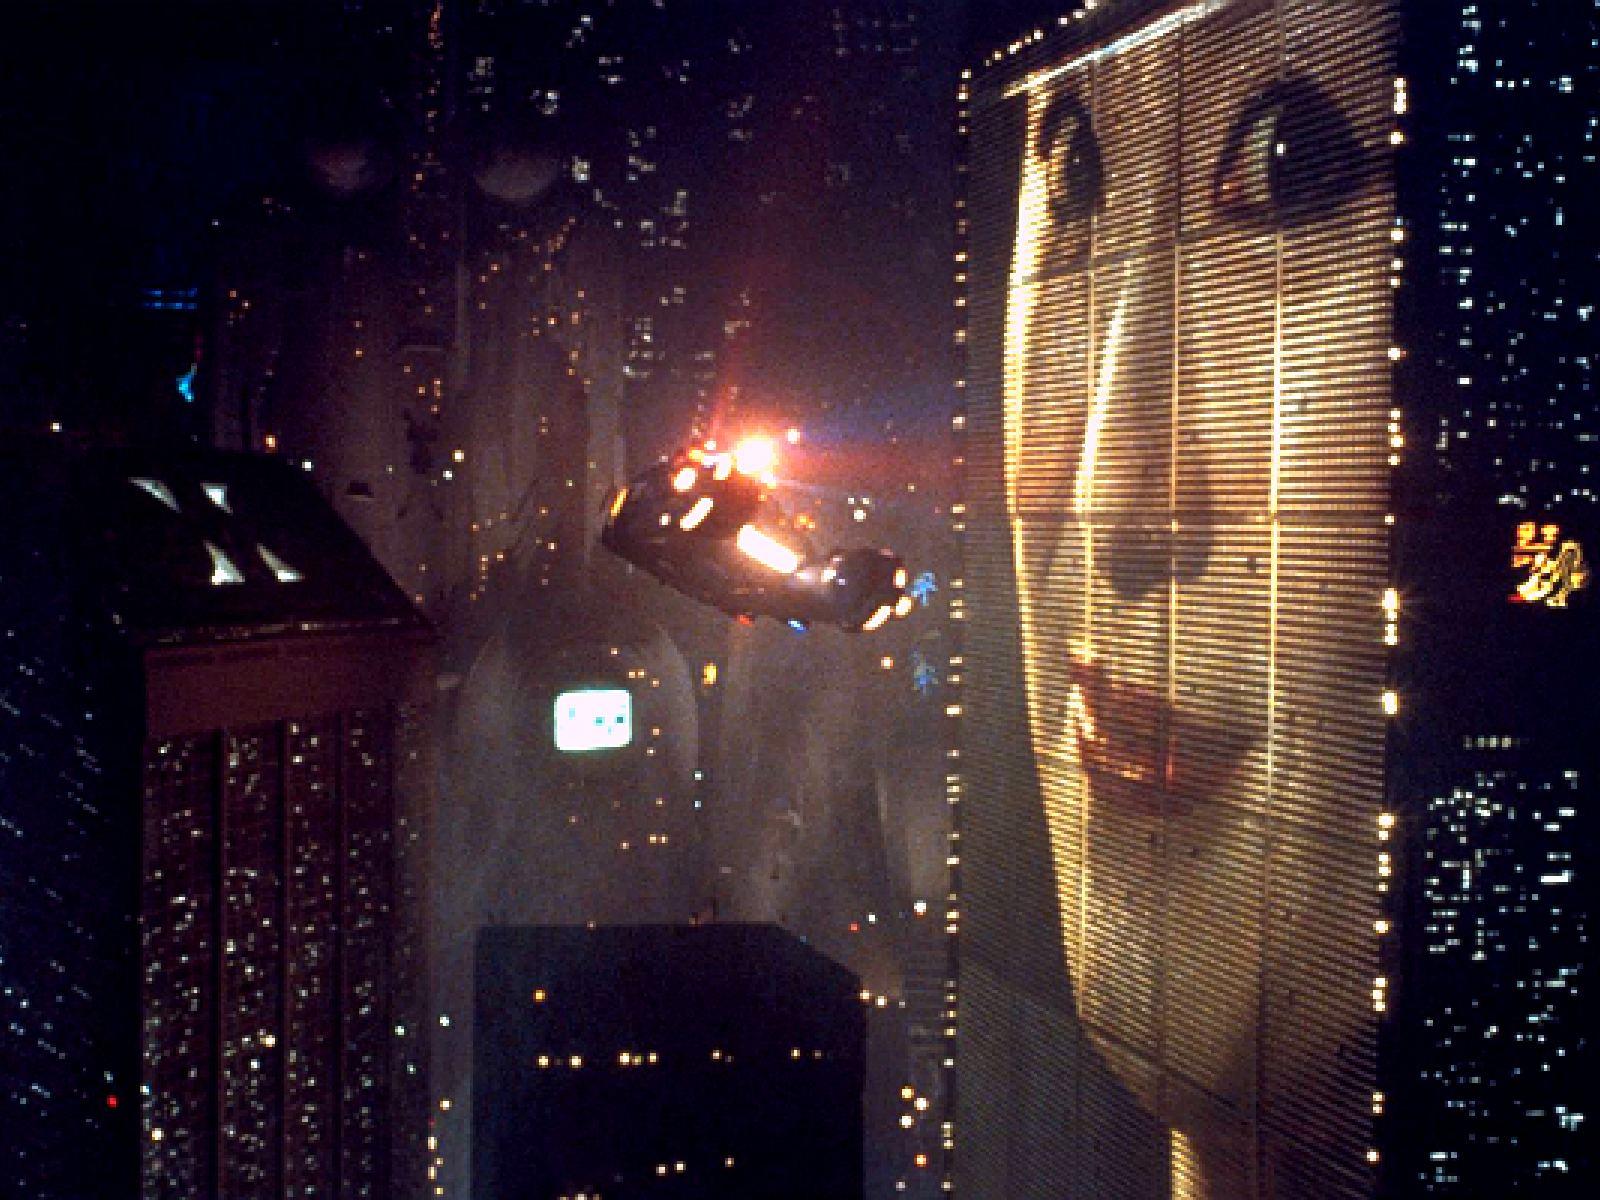 Sf映画の金字塔 Blade Runner のロケ地を回ってみよう Discover